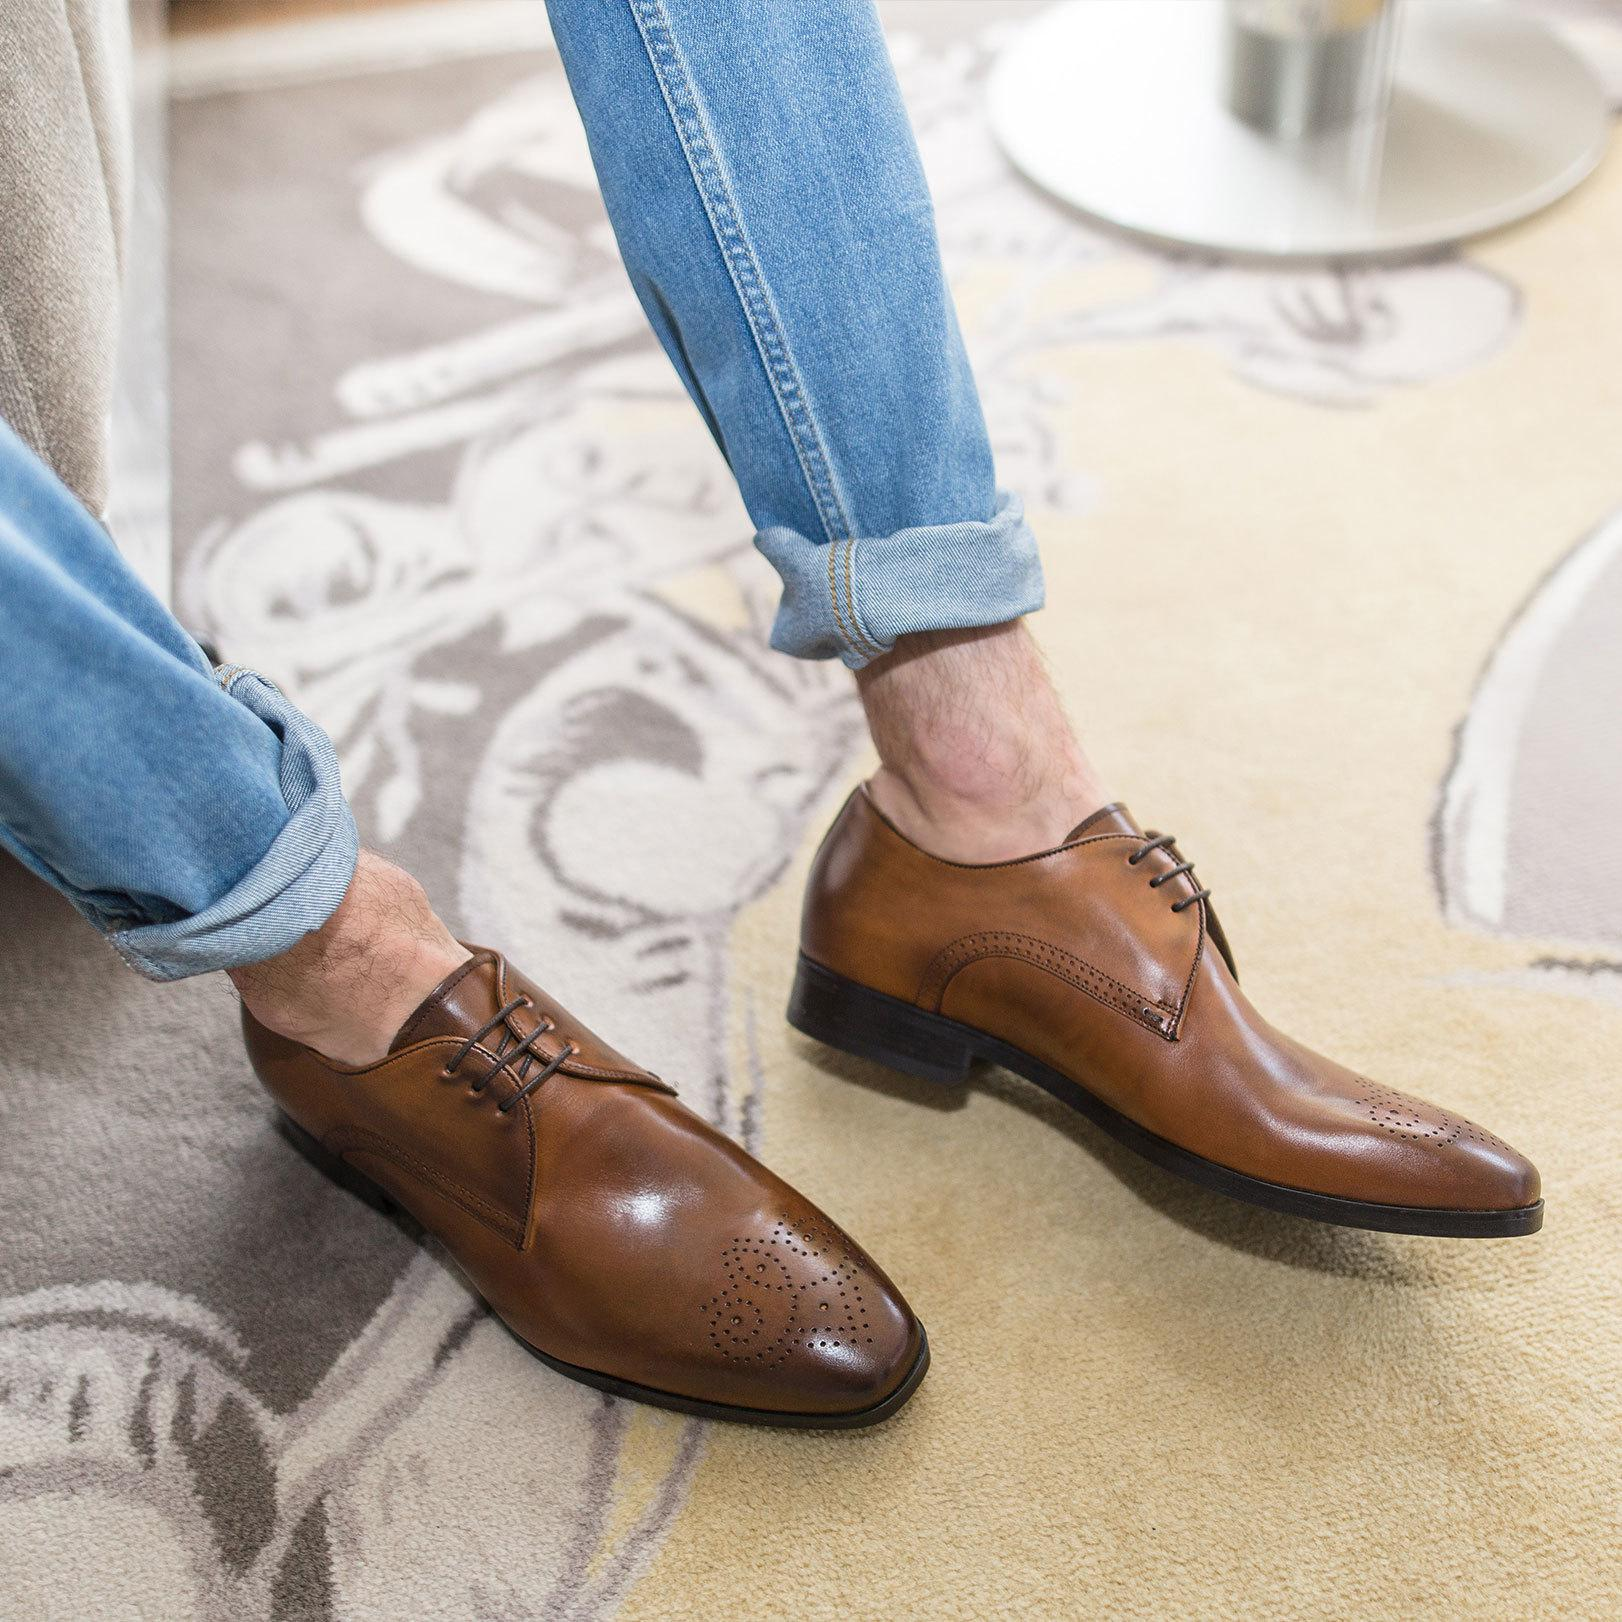 Kurt Geiger London ORSON - Sandals - bronze - Zalando.co.uk